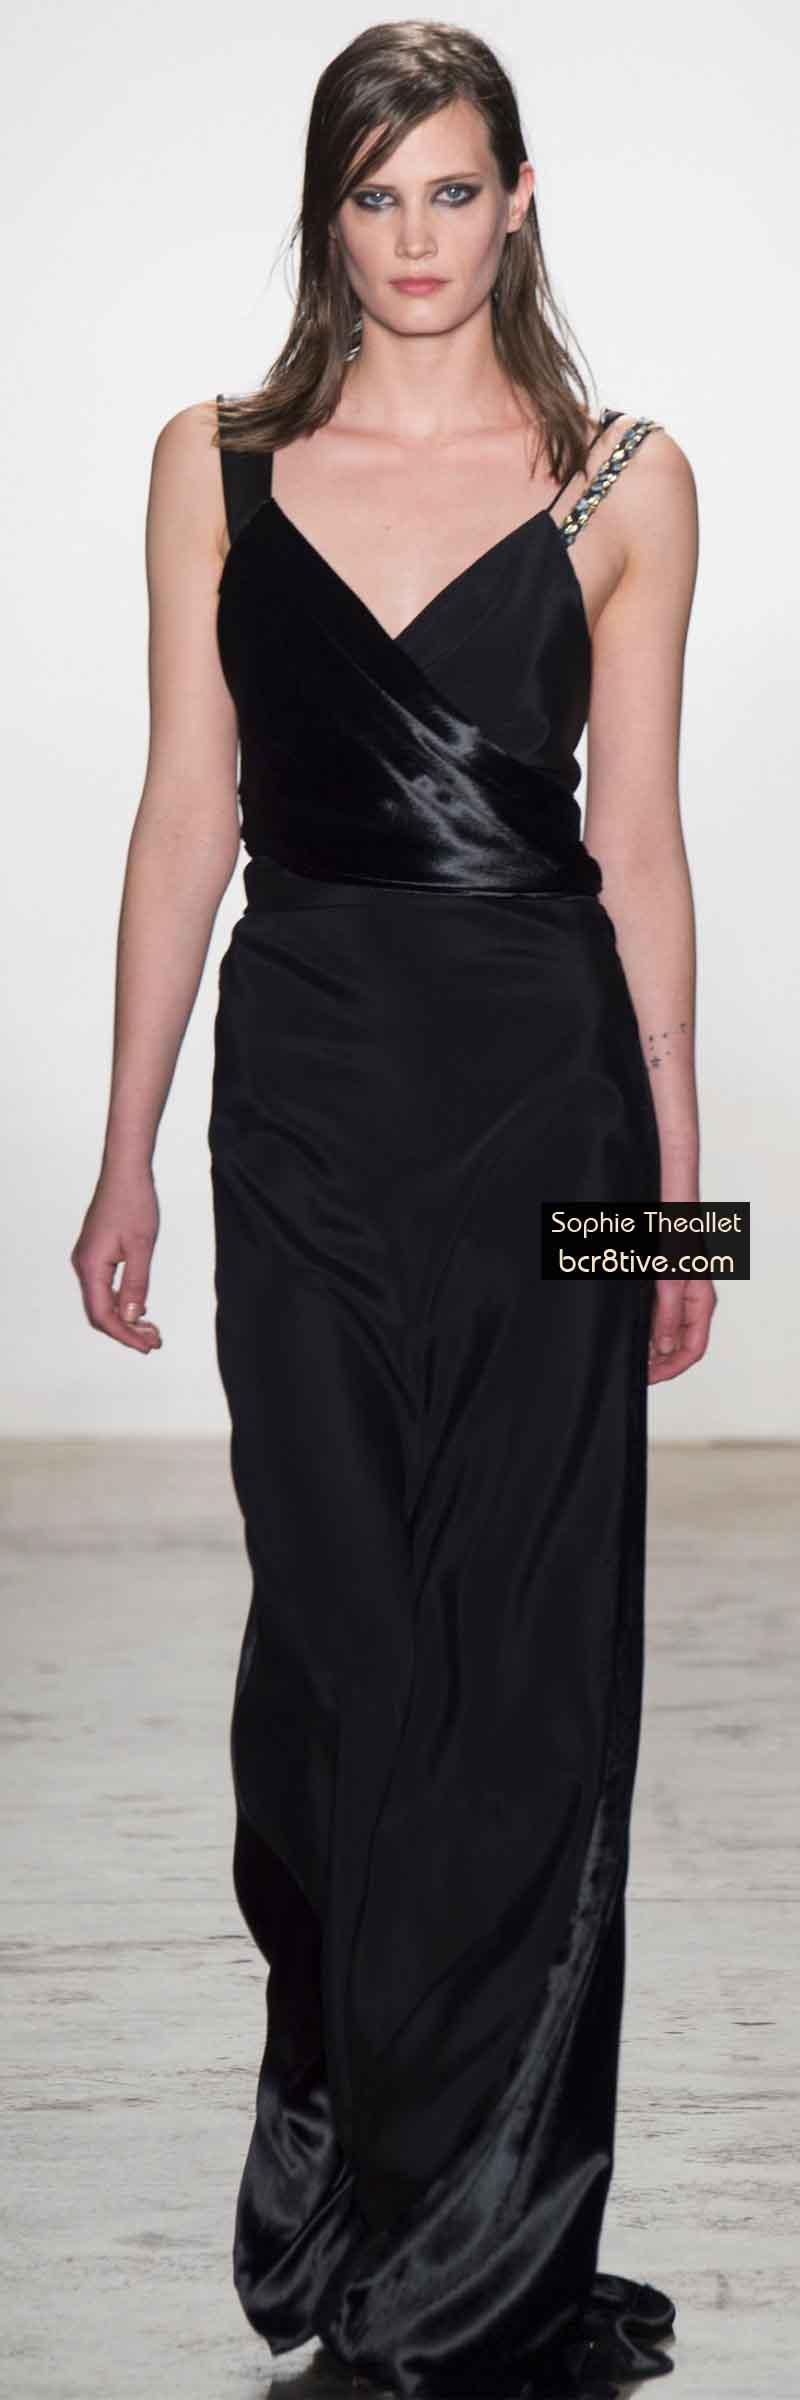 Sophie Theallet FW 2014 #NYFW